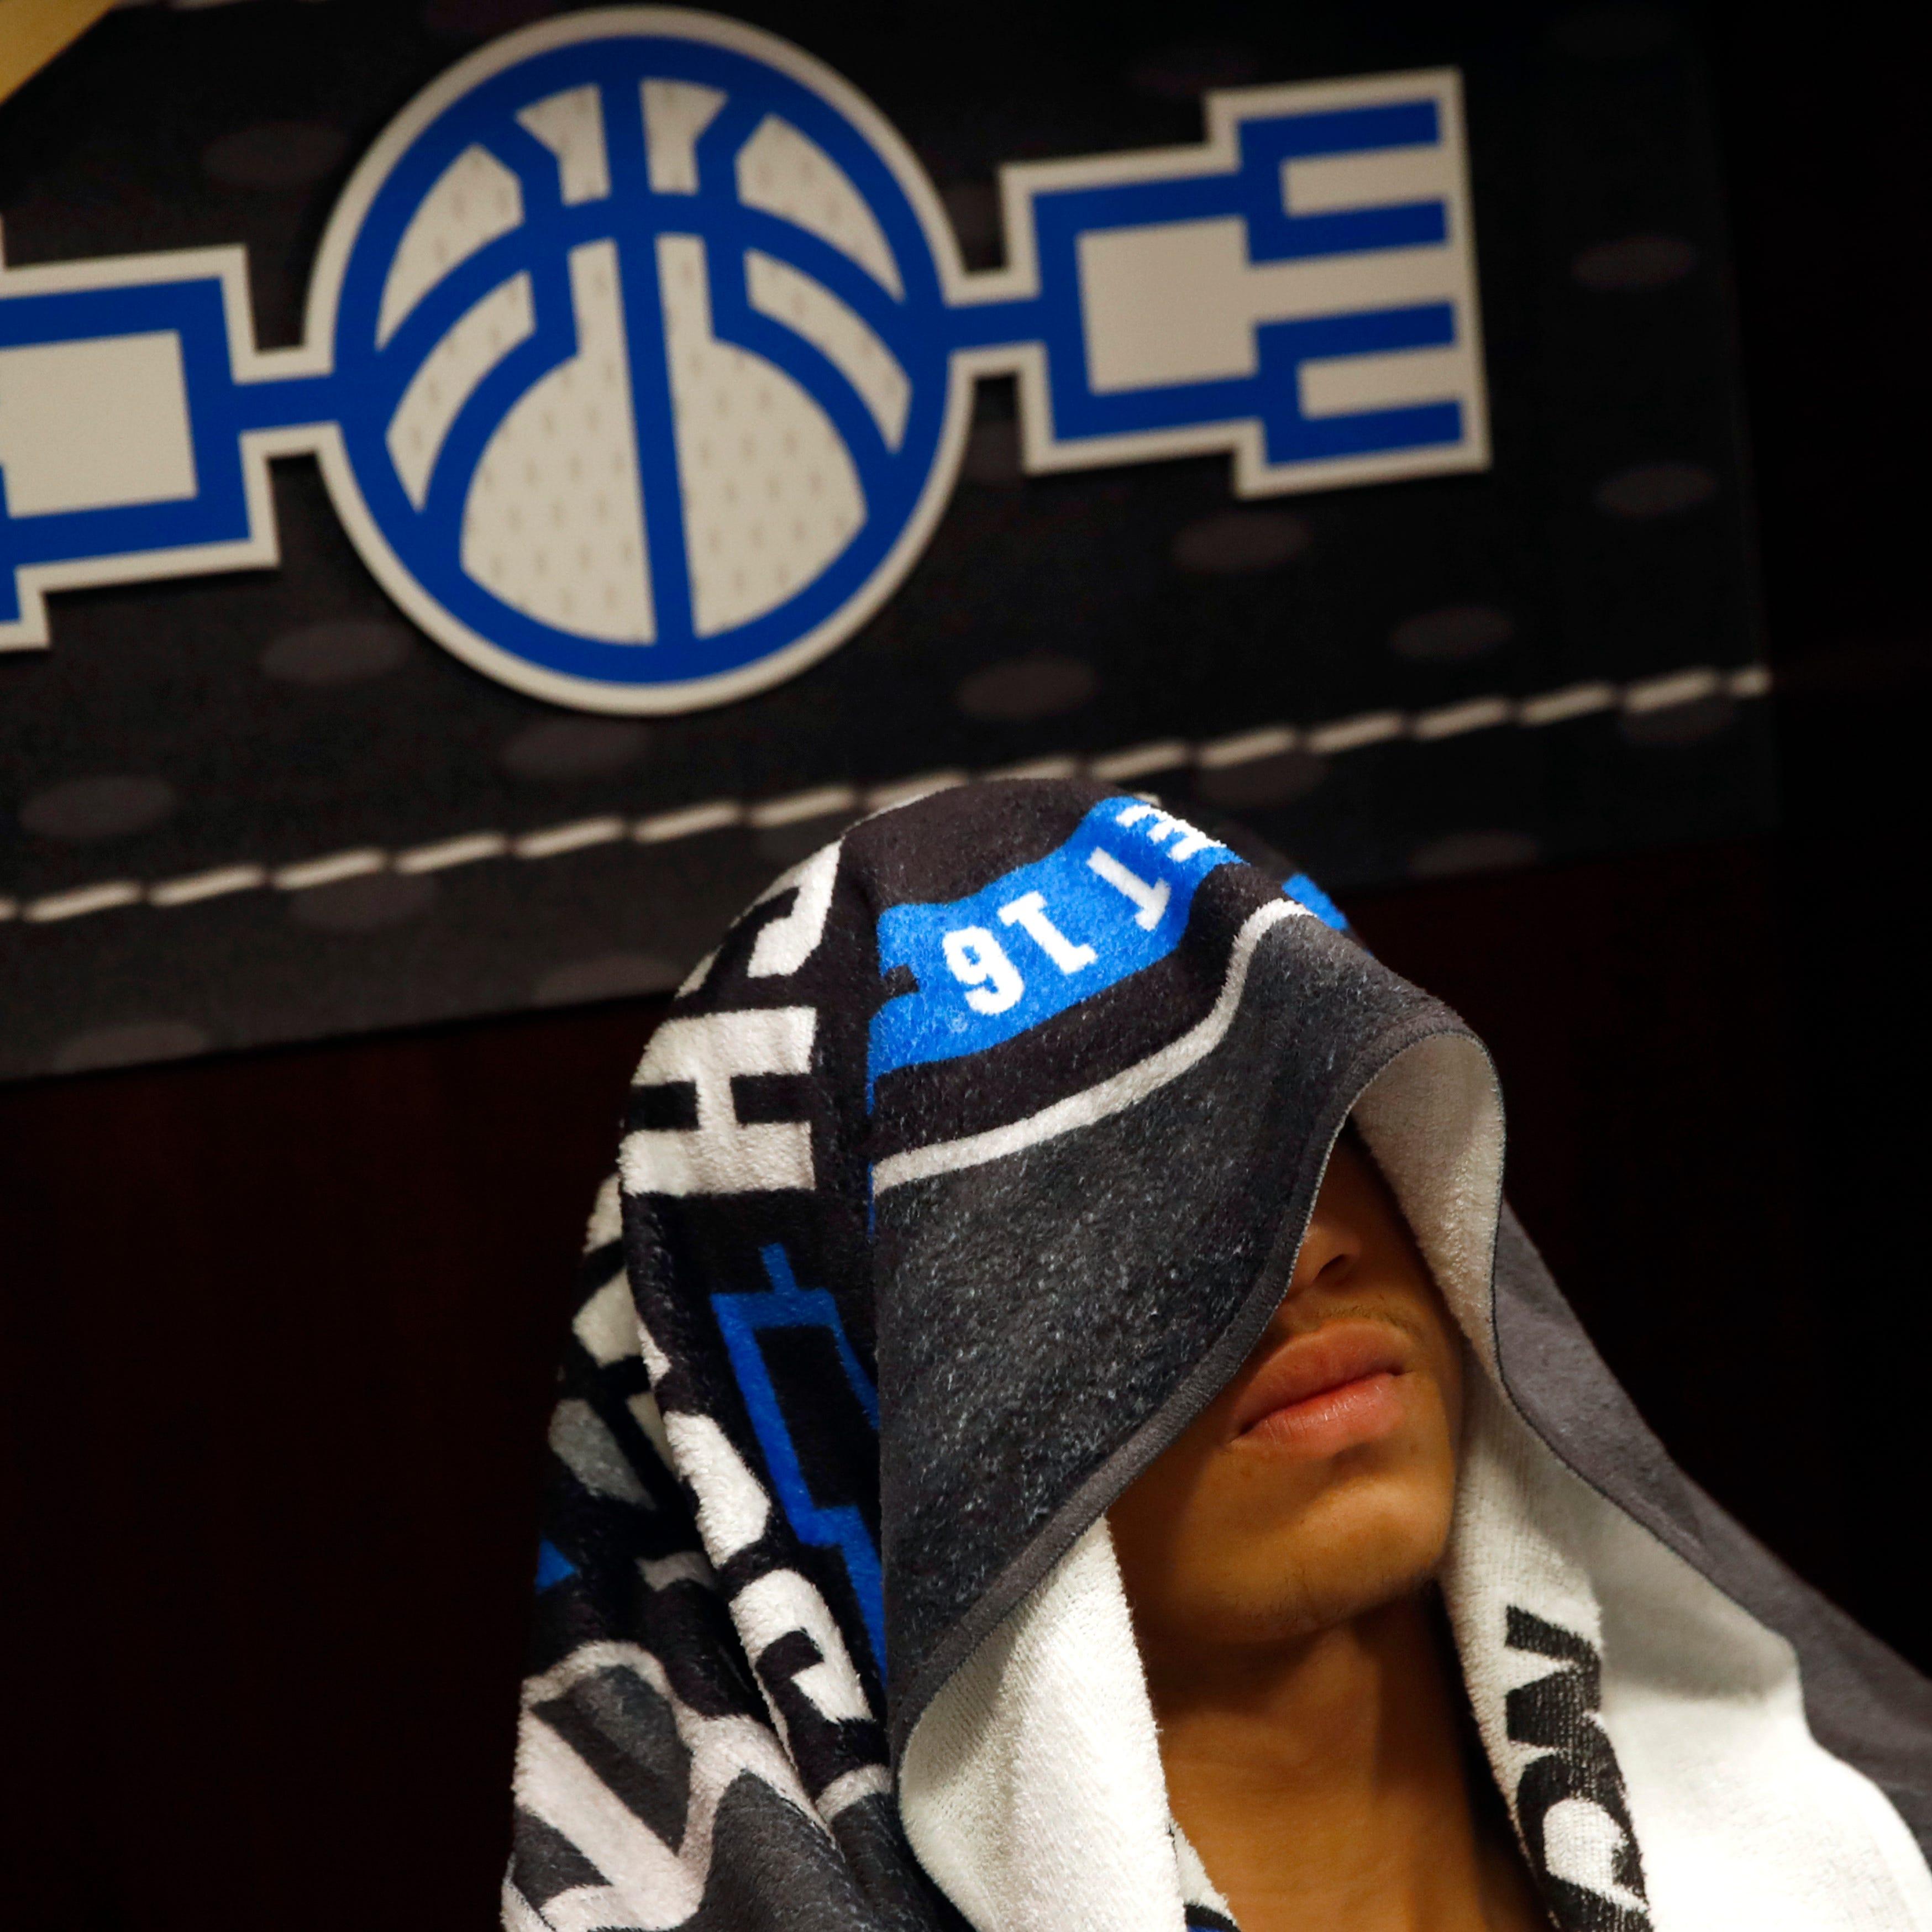 Fans: MSU bid for Final Four had to go through basketball royalty